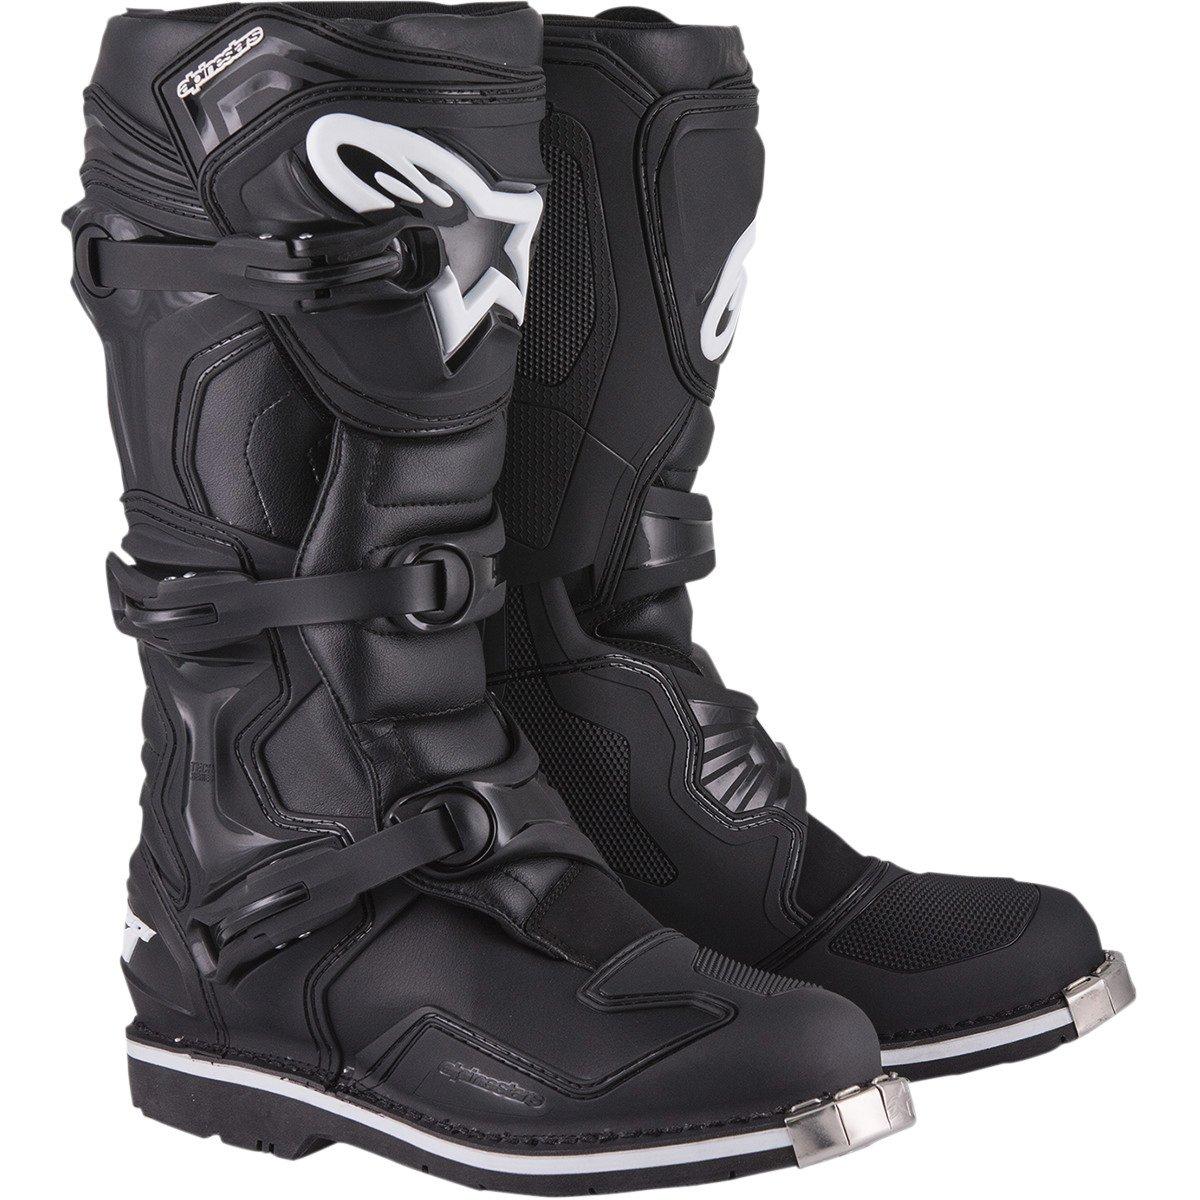 Alpinestars Tech 1 Men's Off-Road Motorcycle Boots - Black / 12